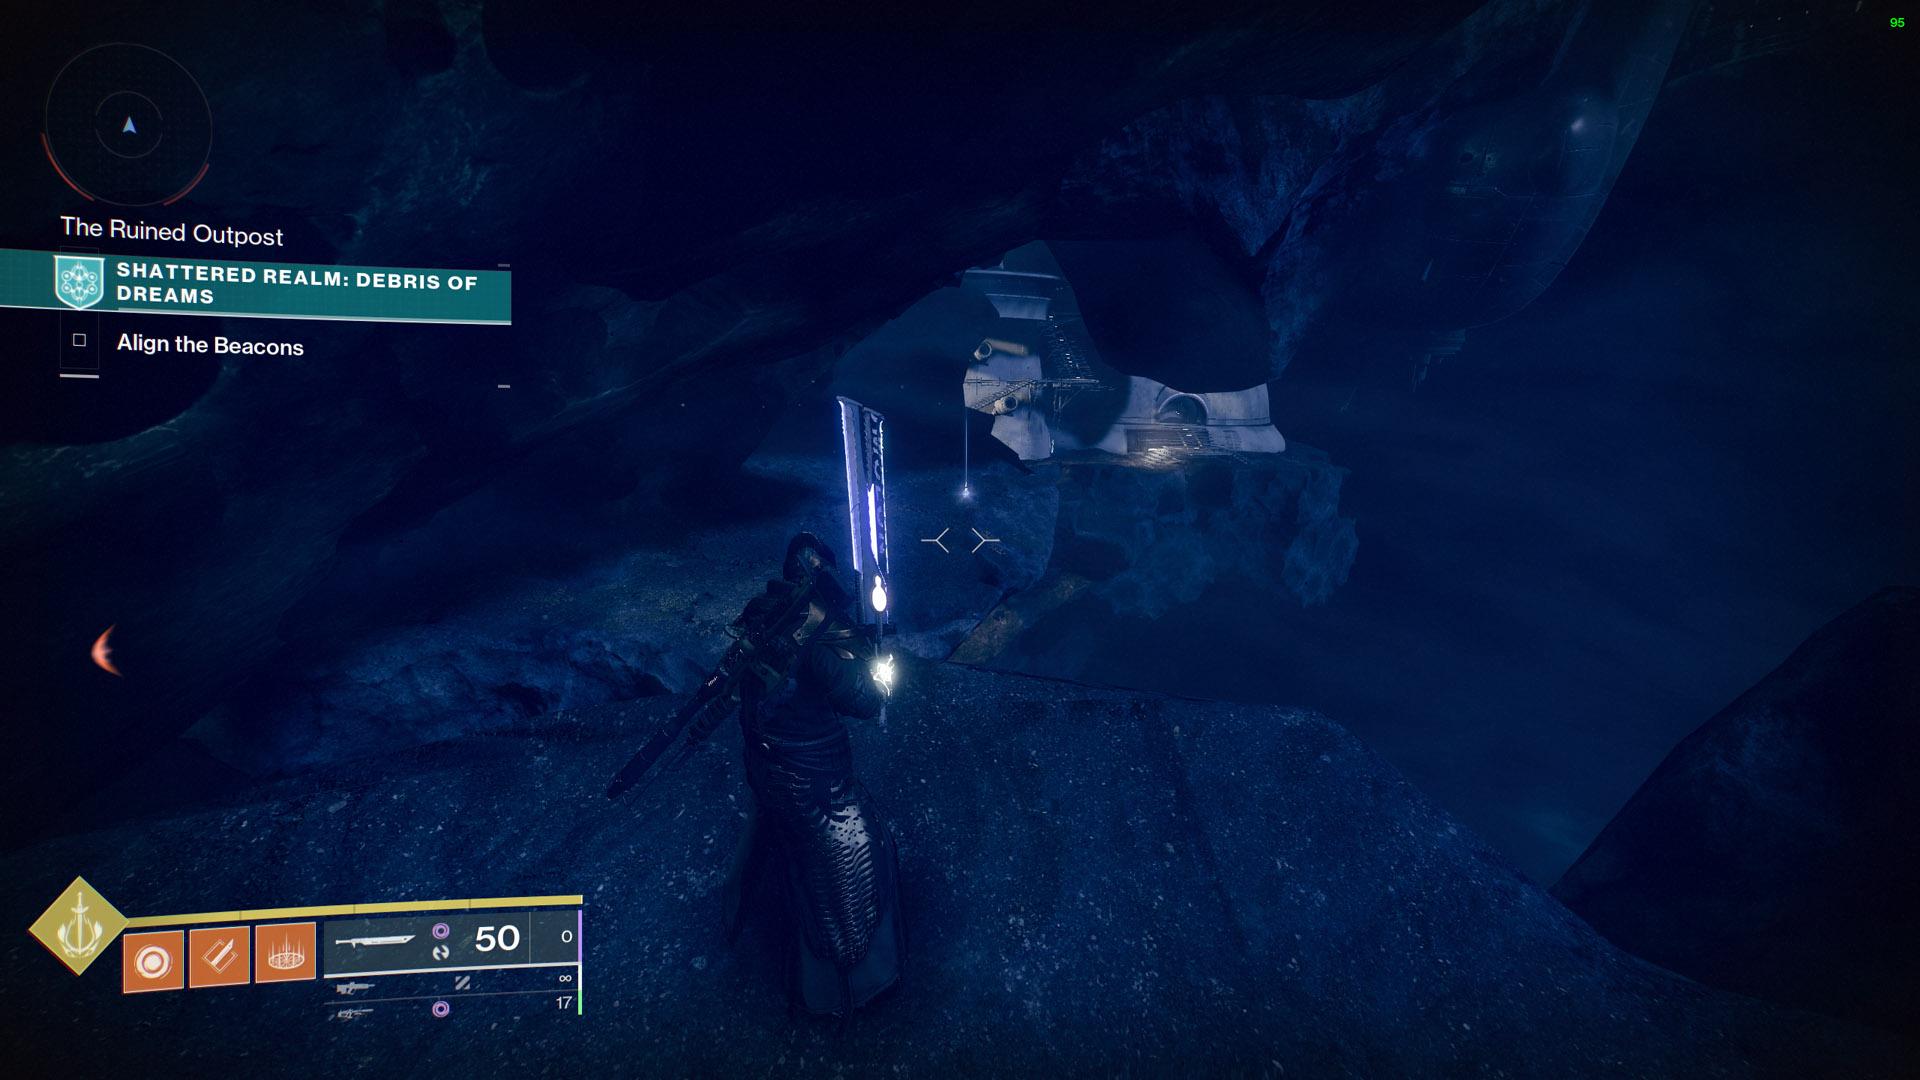 destiny 2 ascendant anchors shattered realm debris of dreams